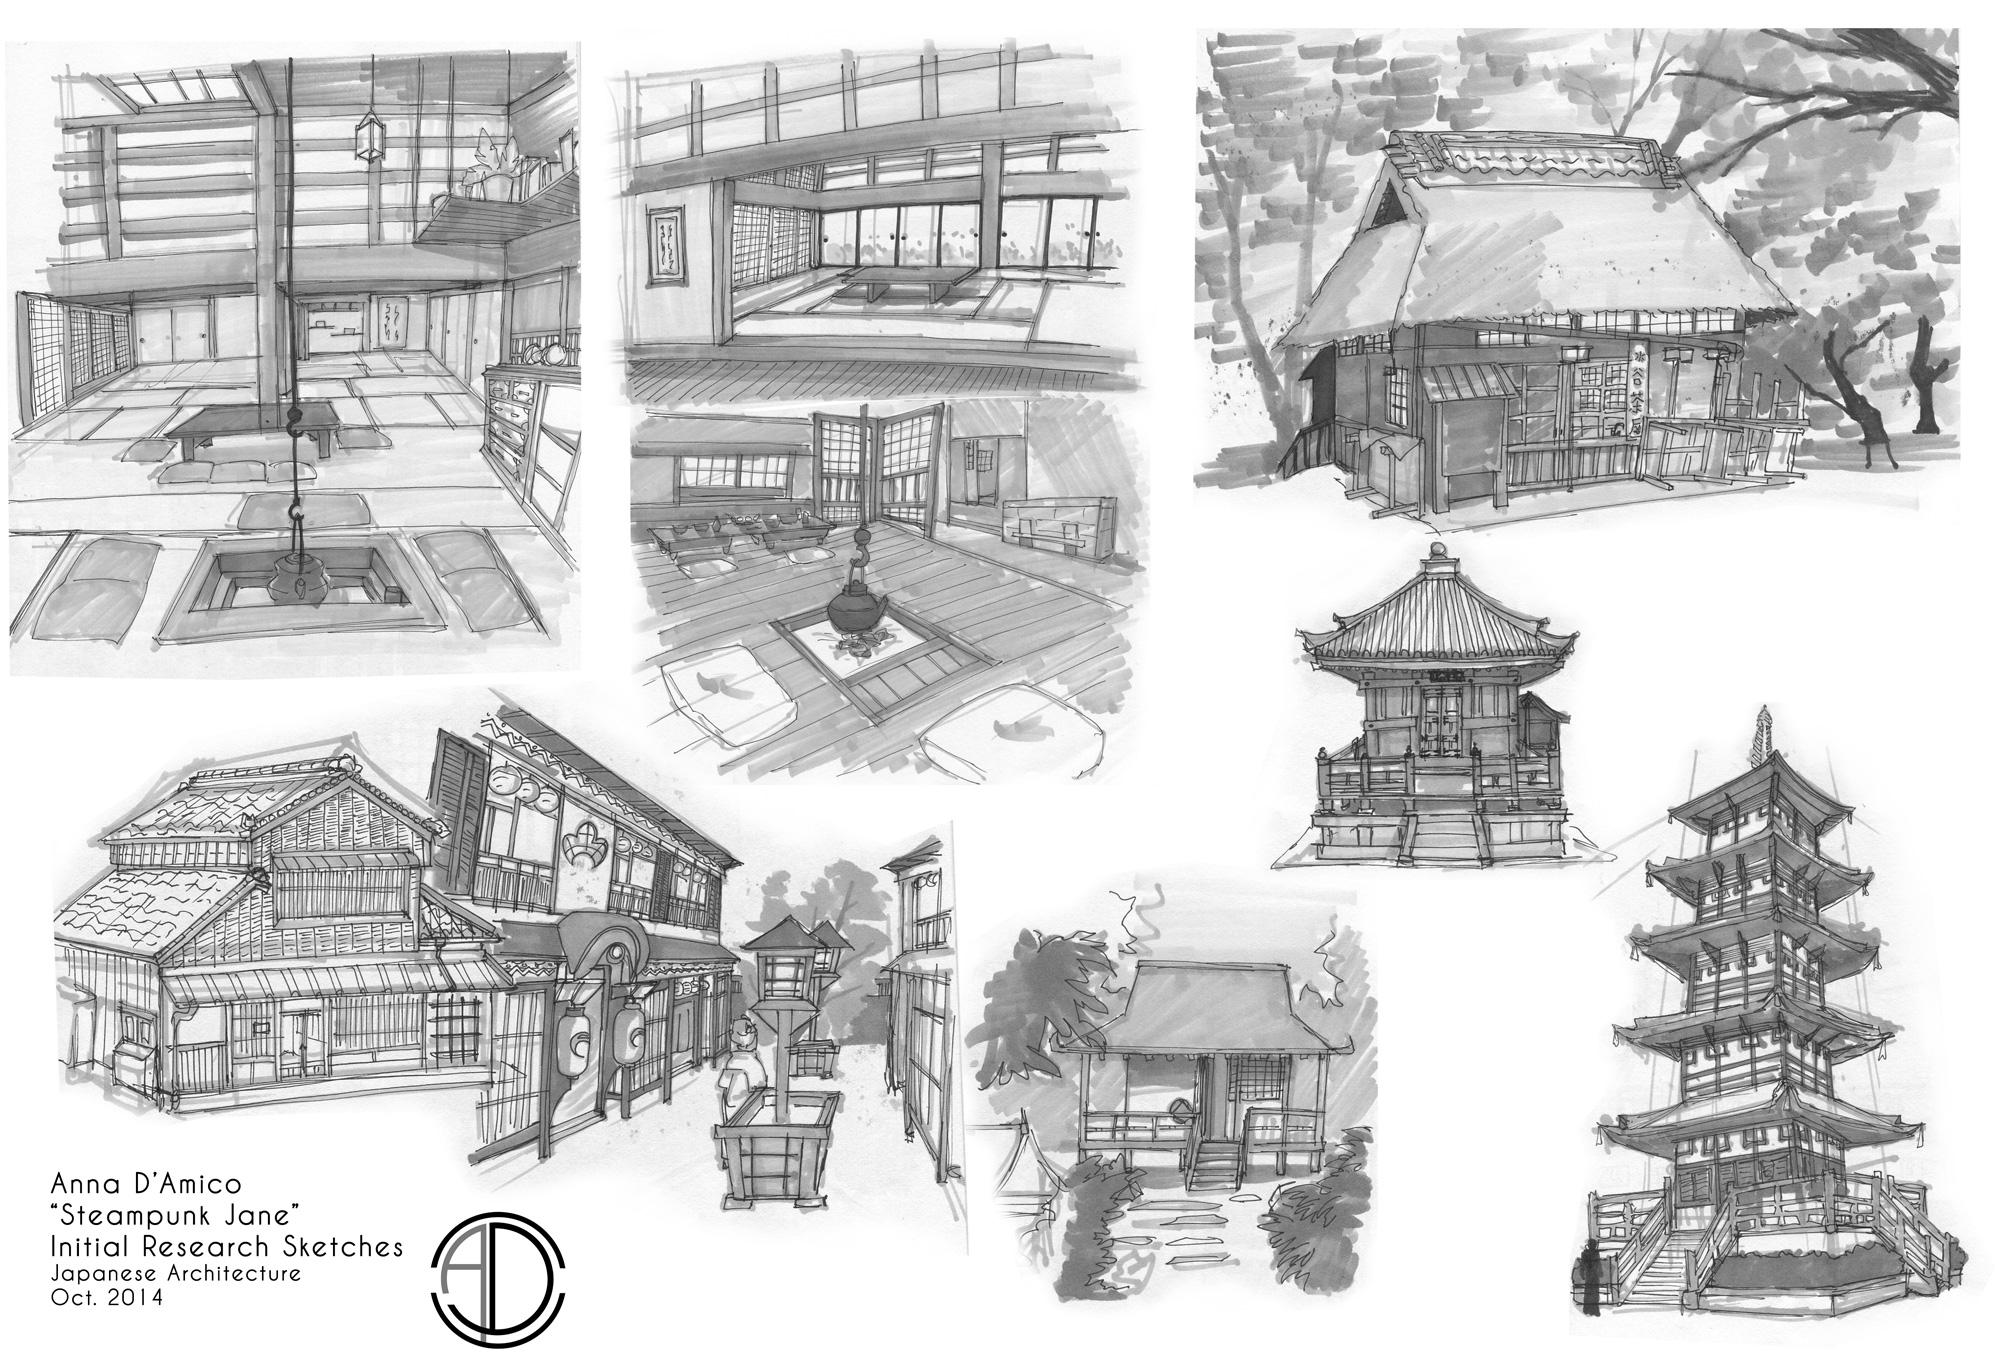 Japan Arch SJane Concept